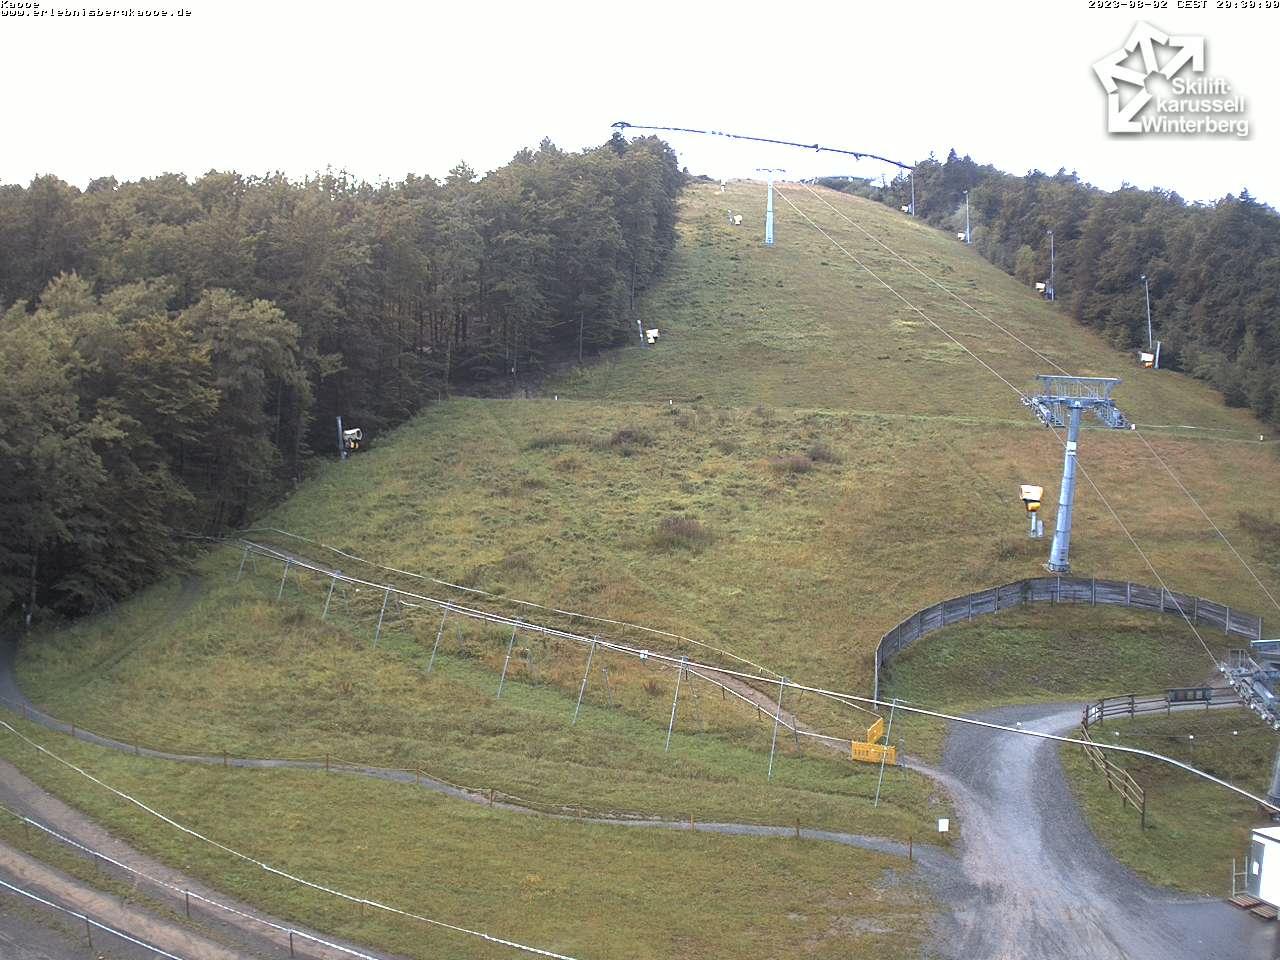 Webcam Slalomhang - Skiliftkarussell Winterberg